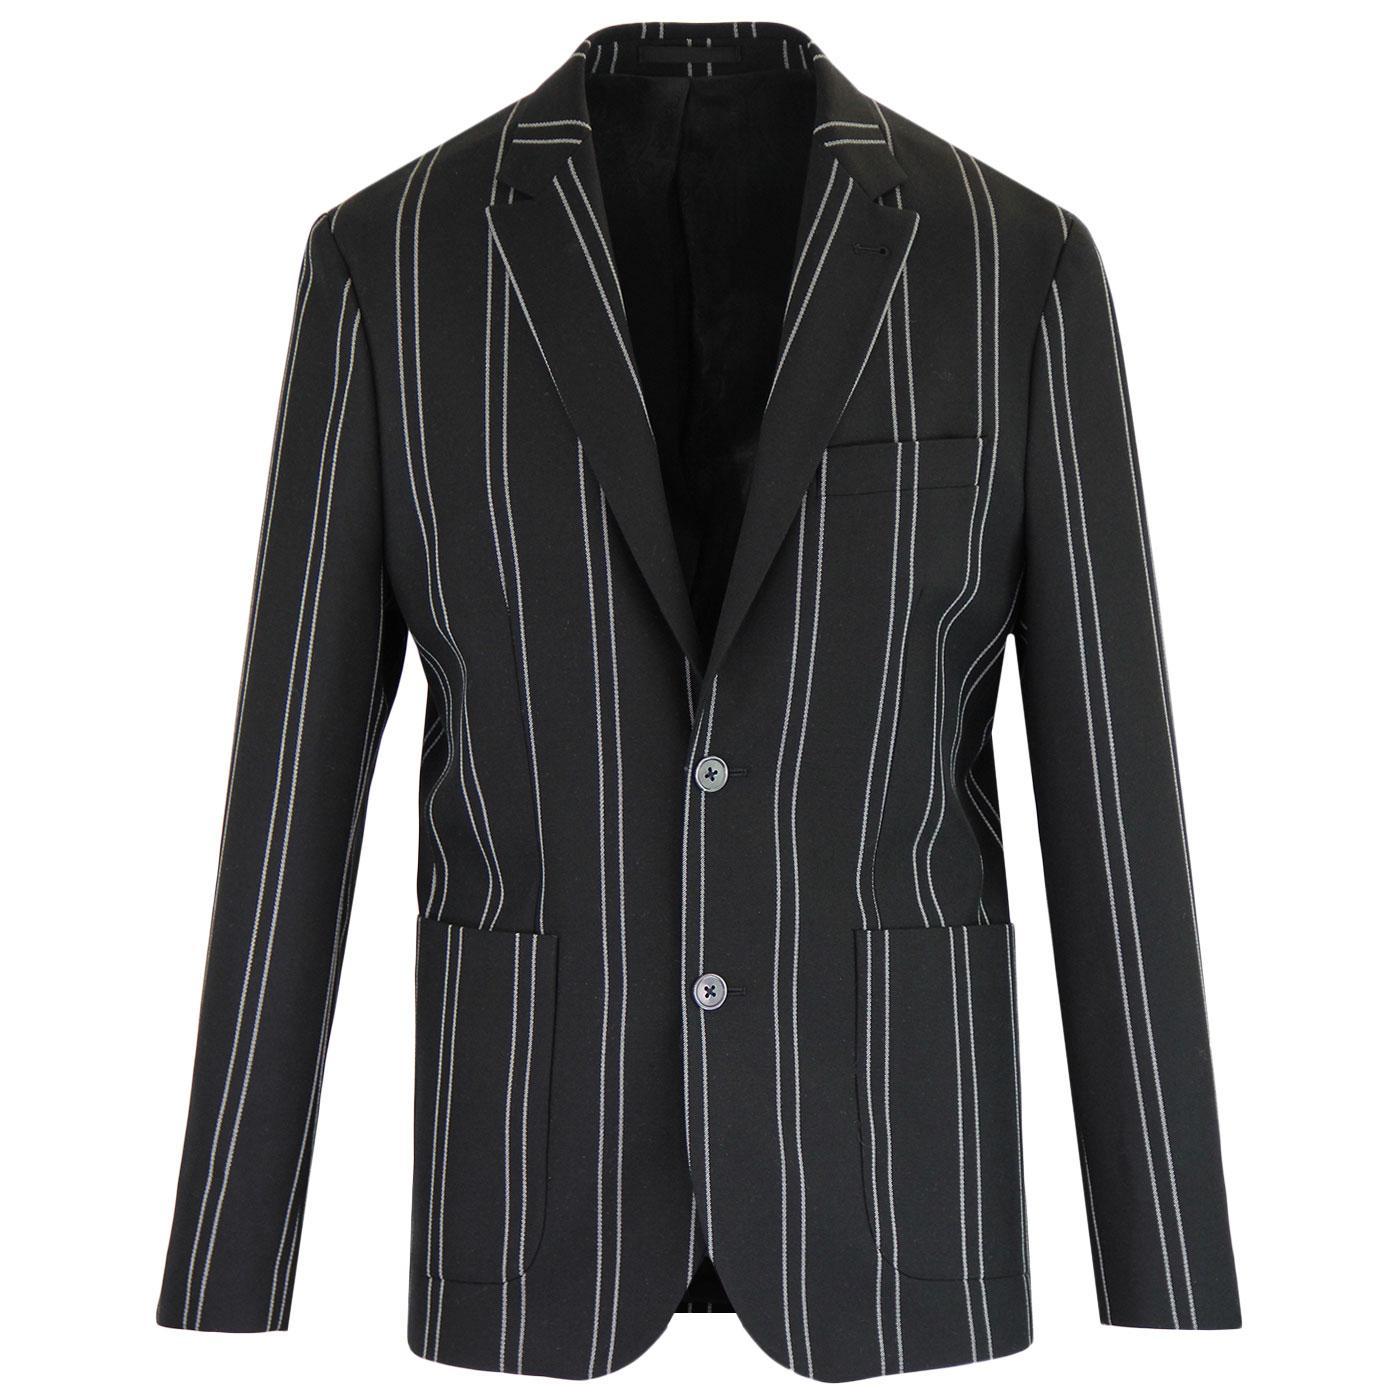 PRETTY GREEN Black Label Mod Pinstripe Suit Jacket